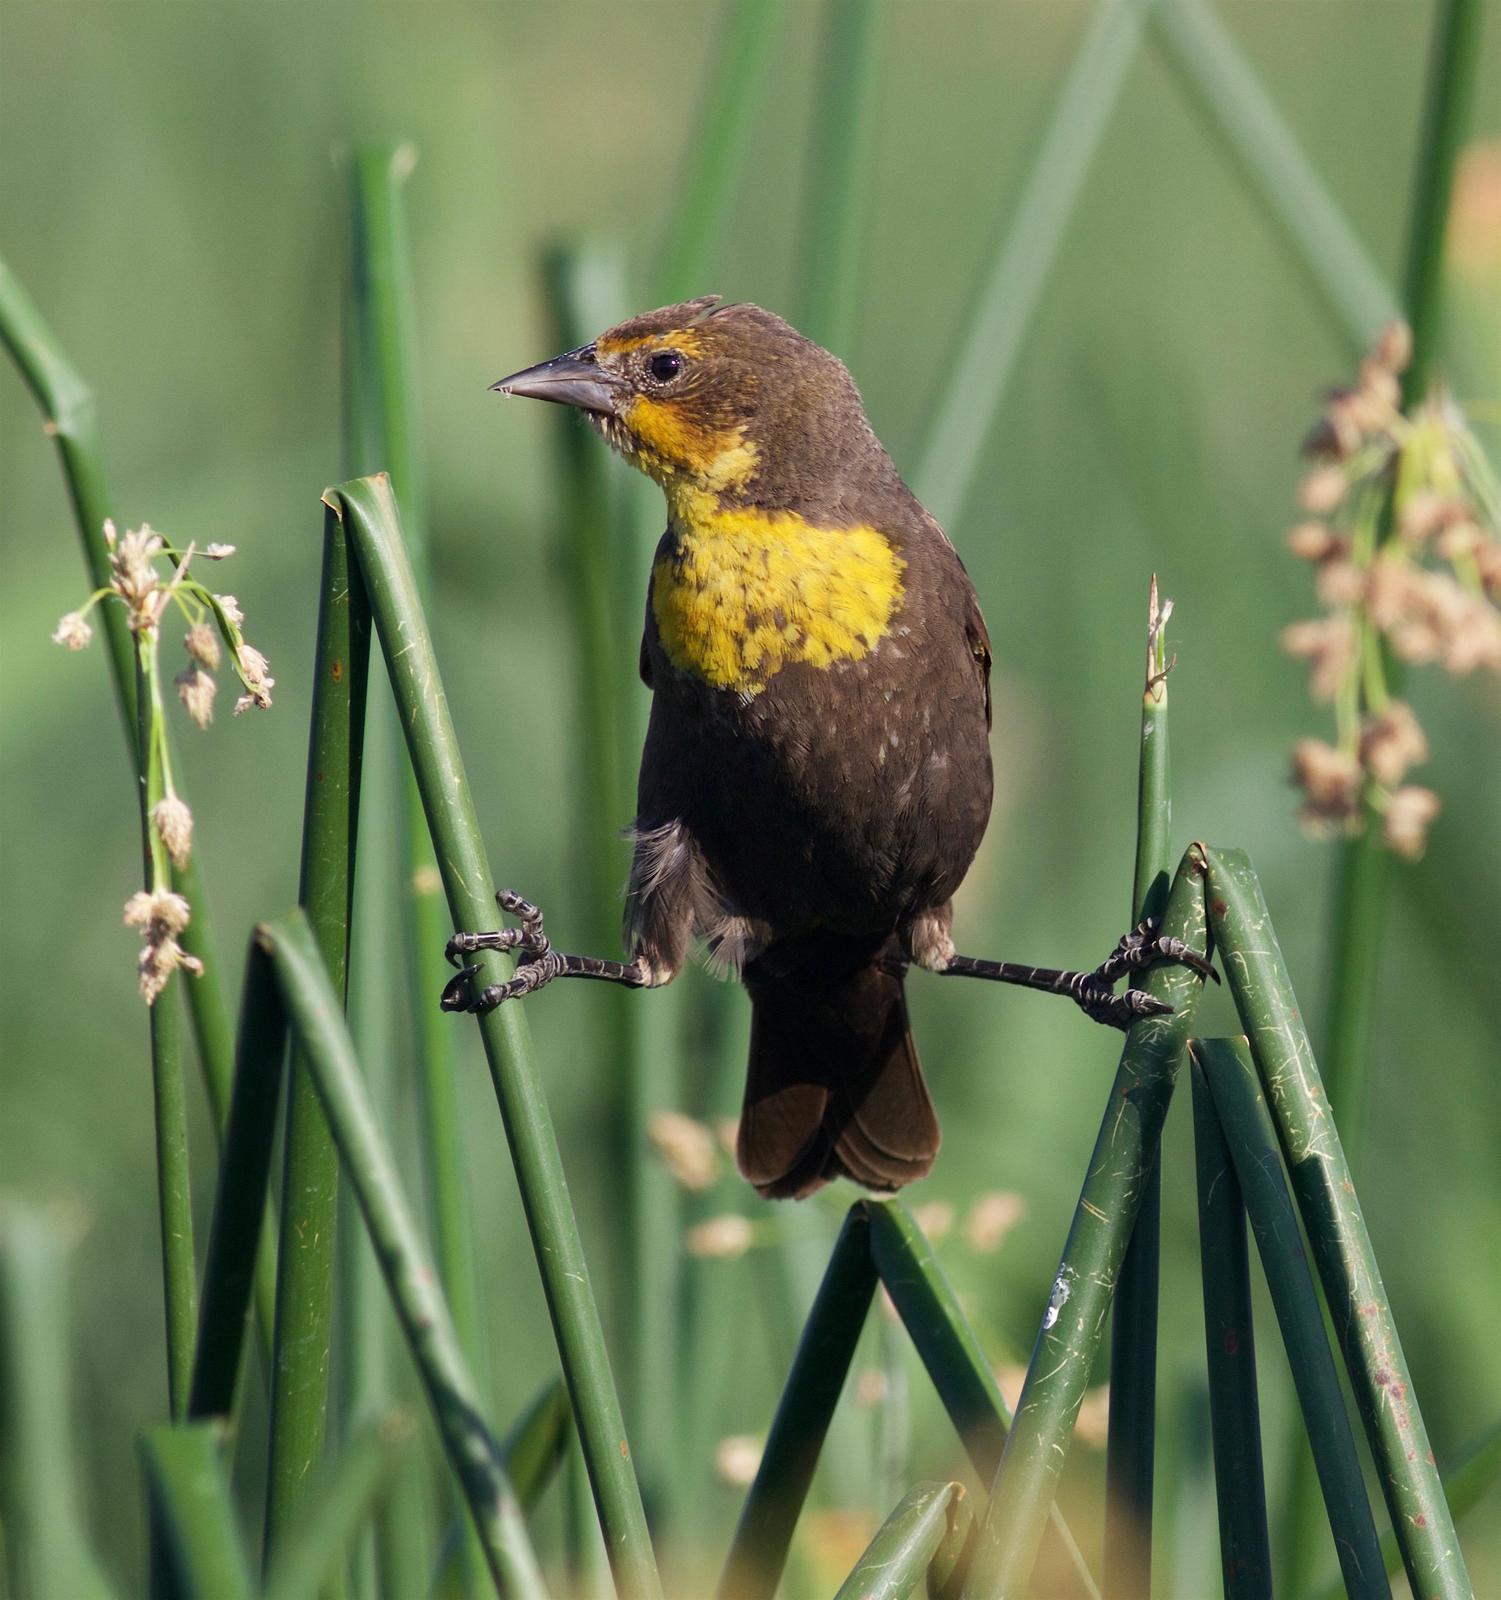 Yellow-headed Blackbird Photo by Kathryn Keith